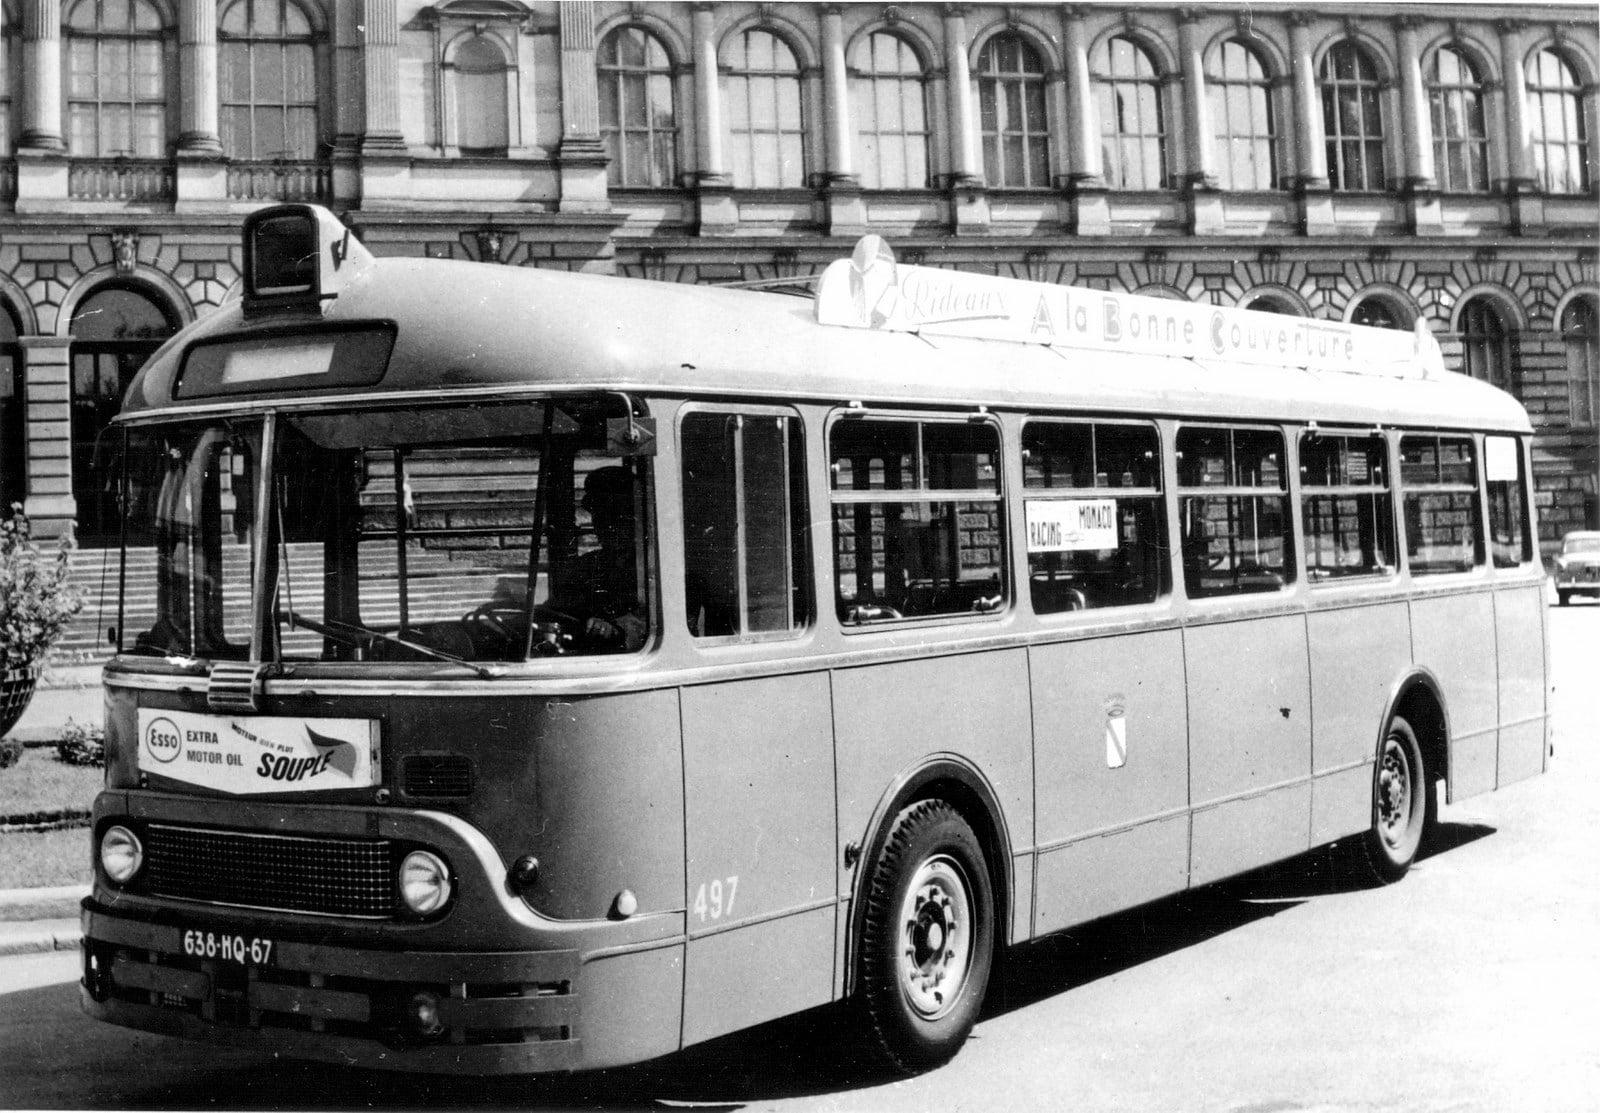 Chausson-SOMUA-bus-type-ASH2-522B,-tegenover-het-Palais-Universitaire--Straasburg